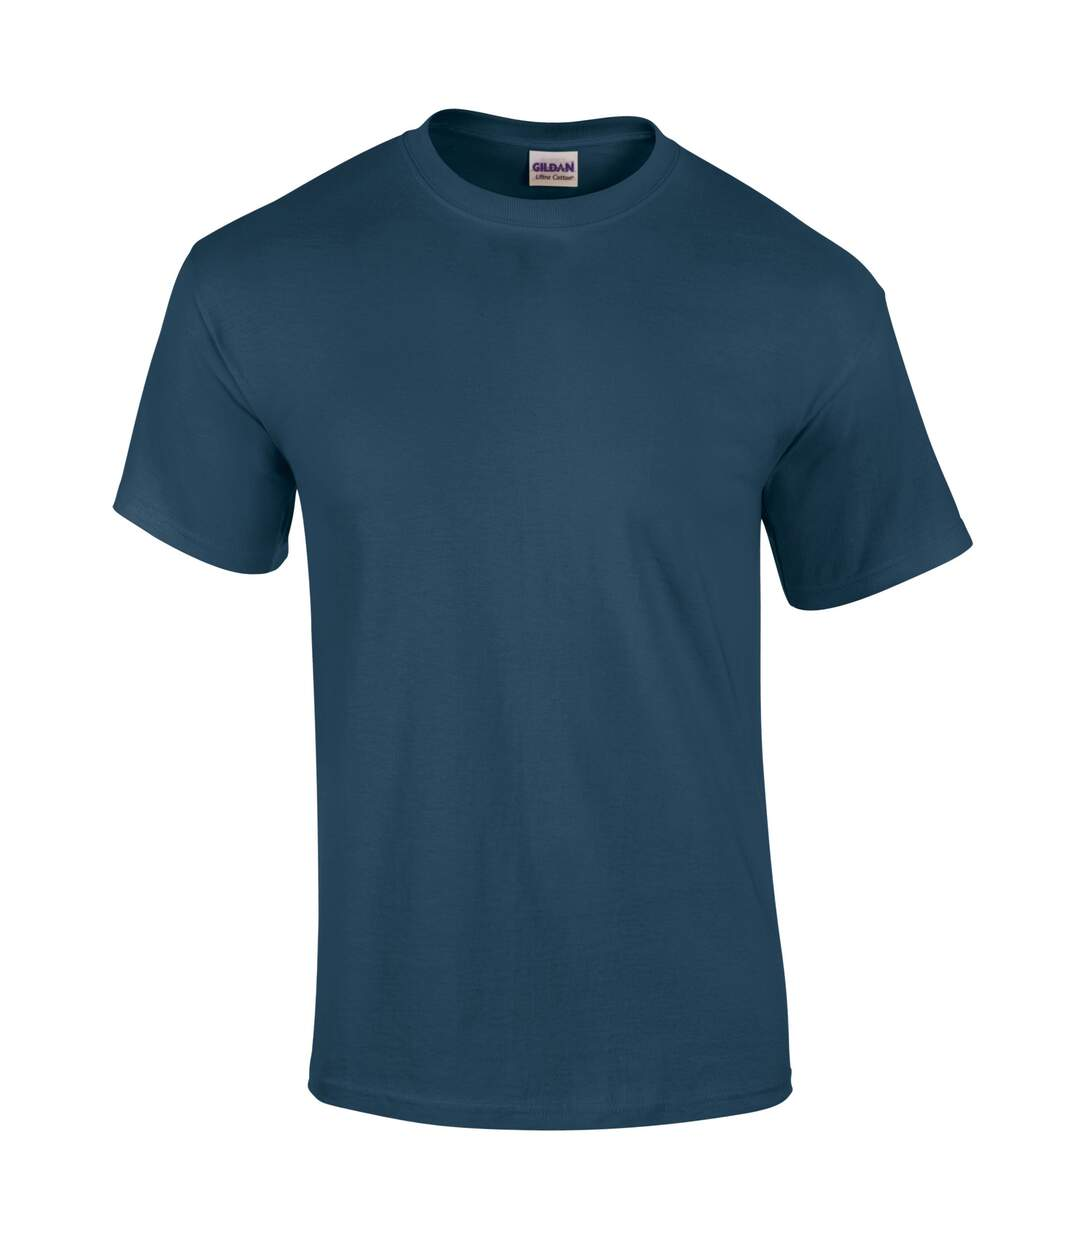 Gildan Mens Ultra Cotton Short Sleeve T-Shirt (Daisy) - UTBC475